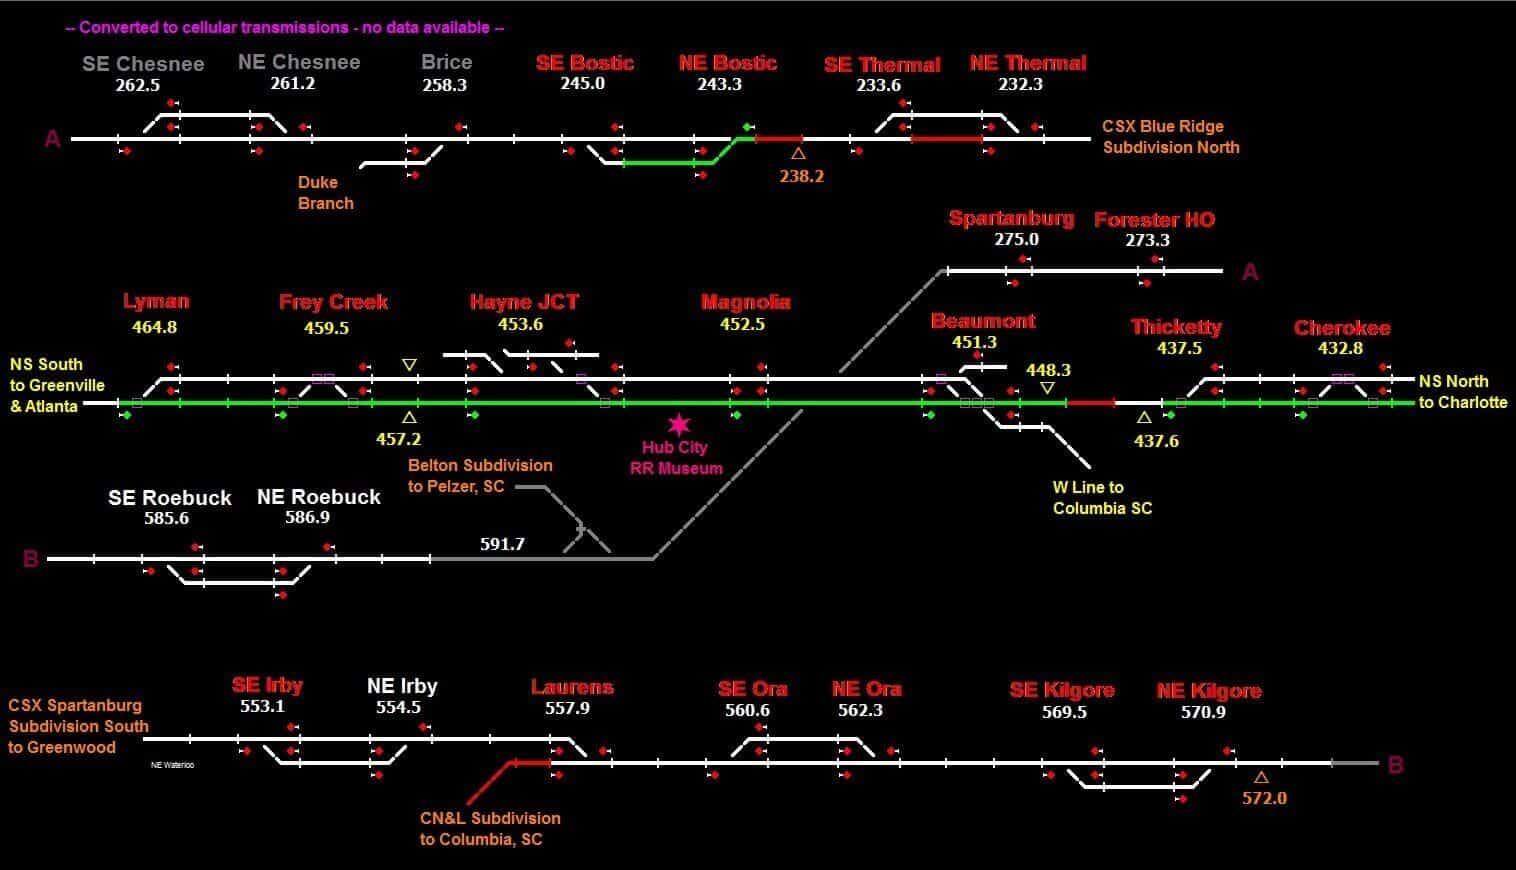 Otomatik Tren Kontrol Sistemi (ATCS)